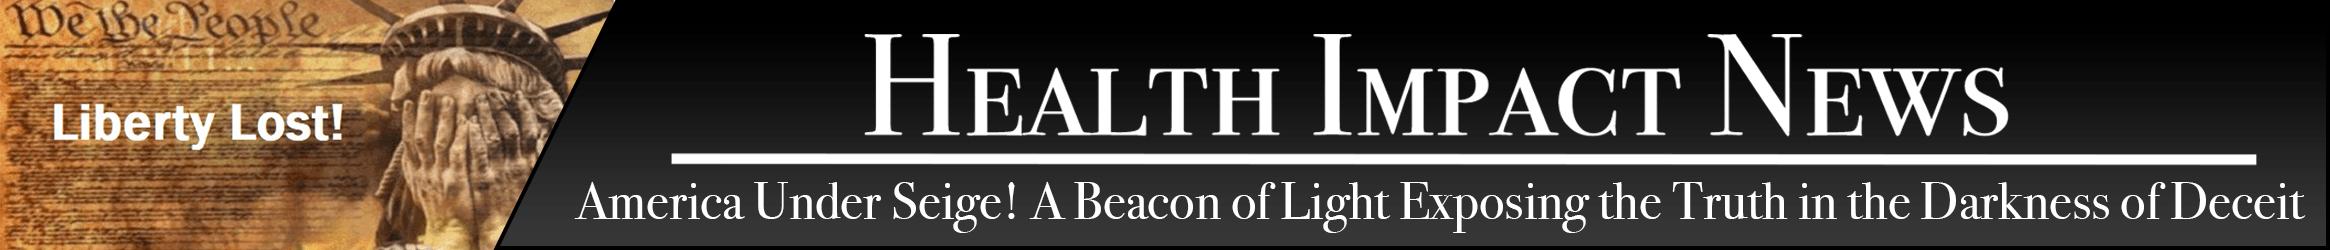 Health Impact News